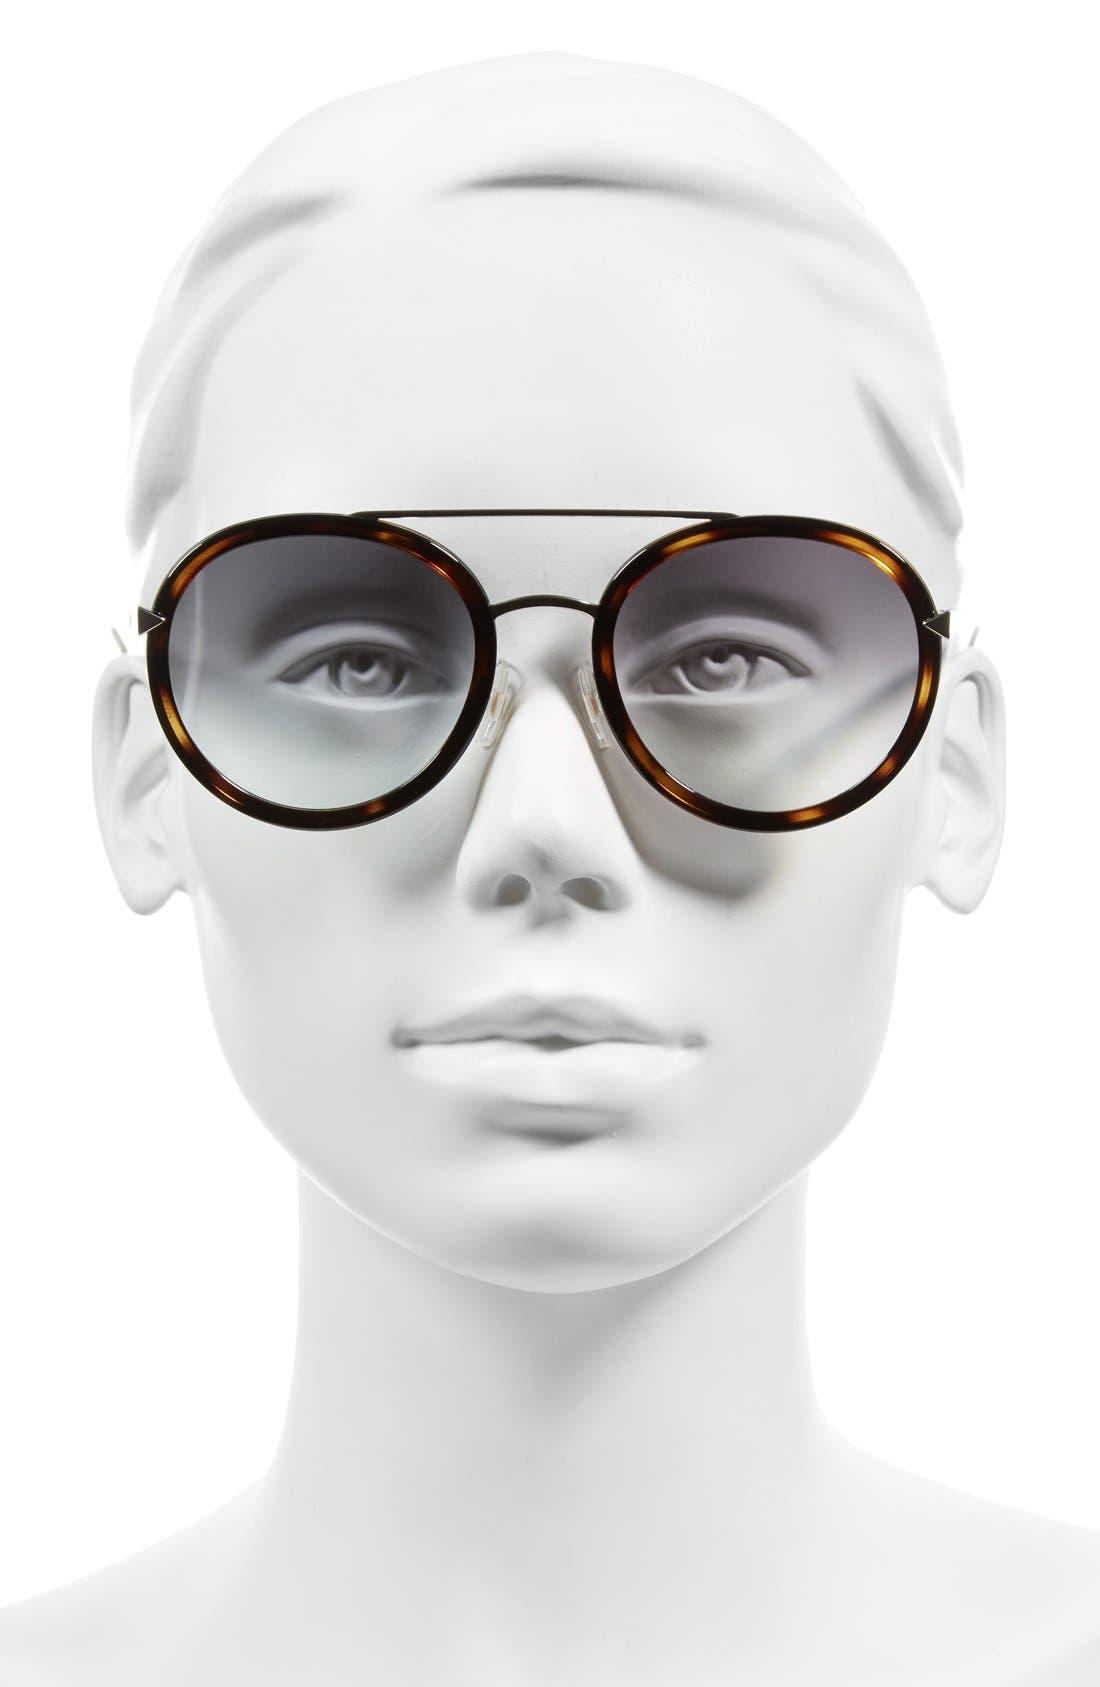 51mm Round Aviator Sunglasses,                             Alternate thumbnail 2, color,                             HAVANA/ GOLD